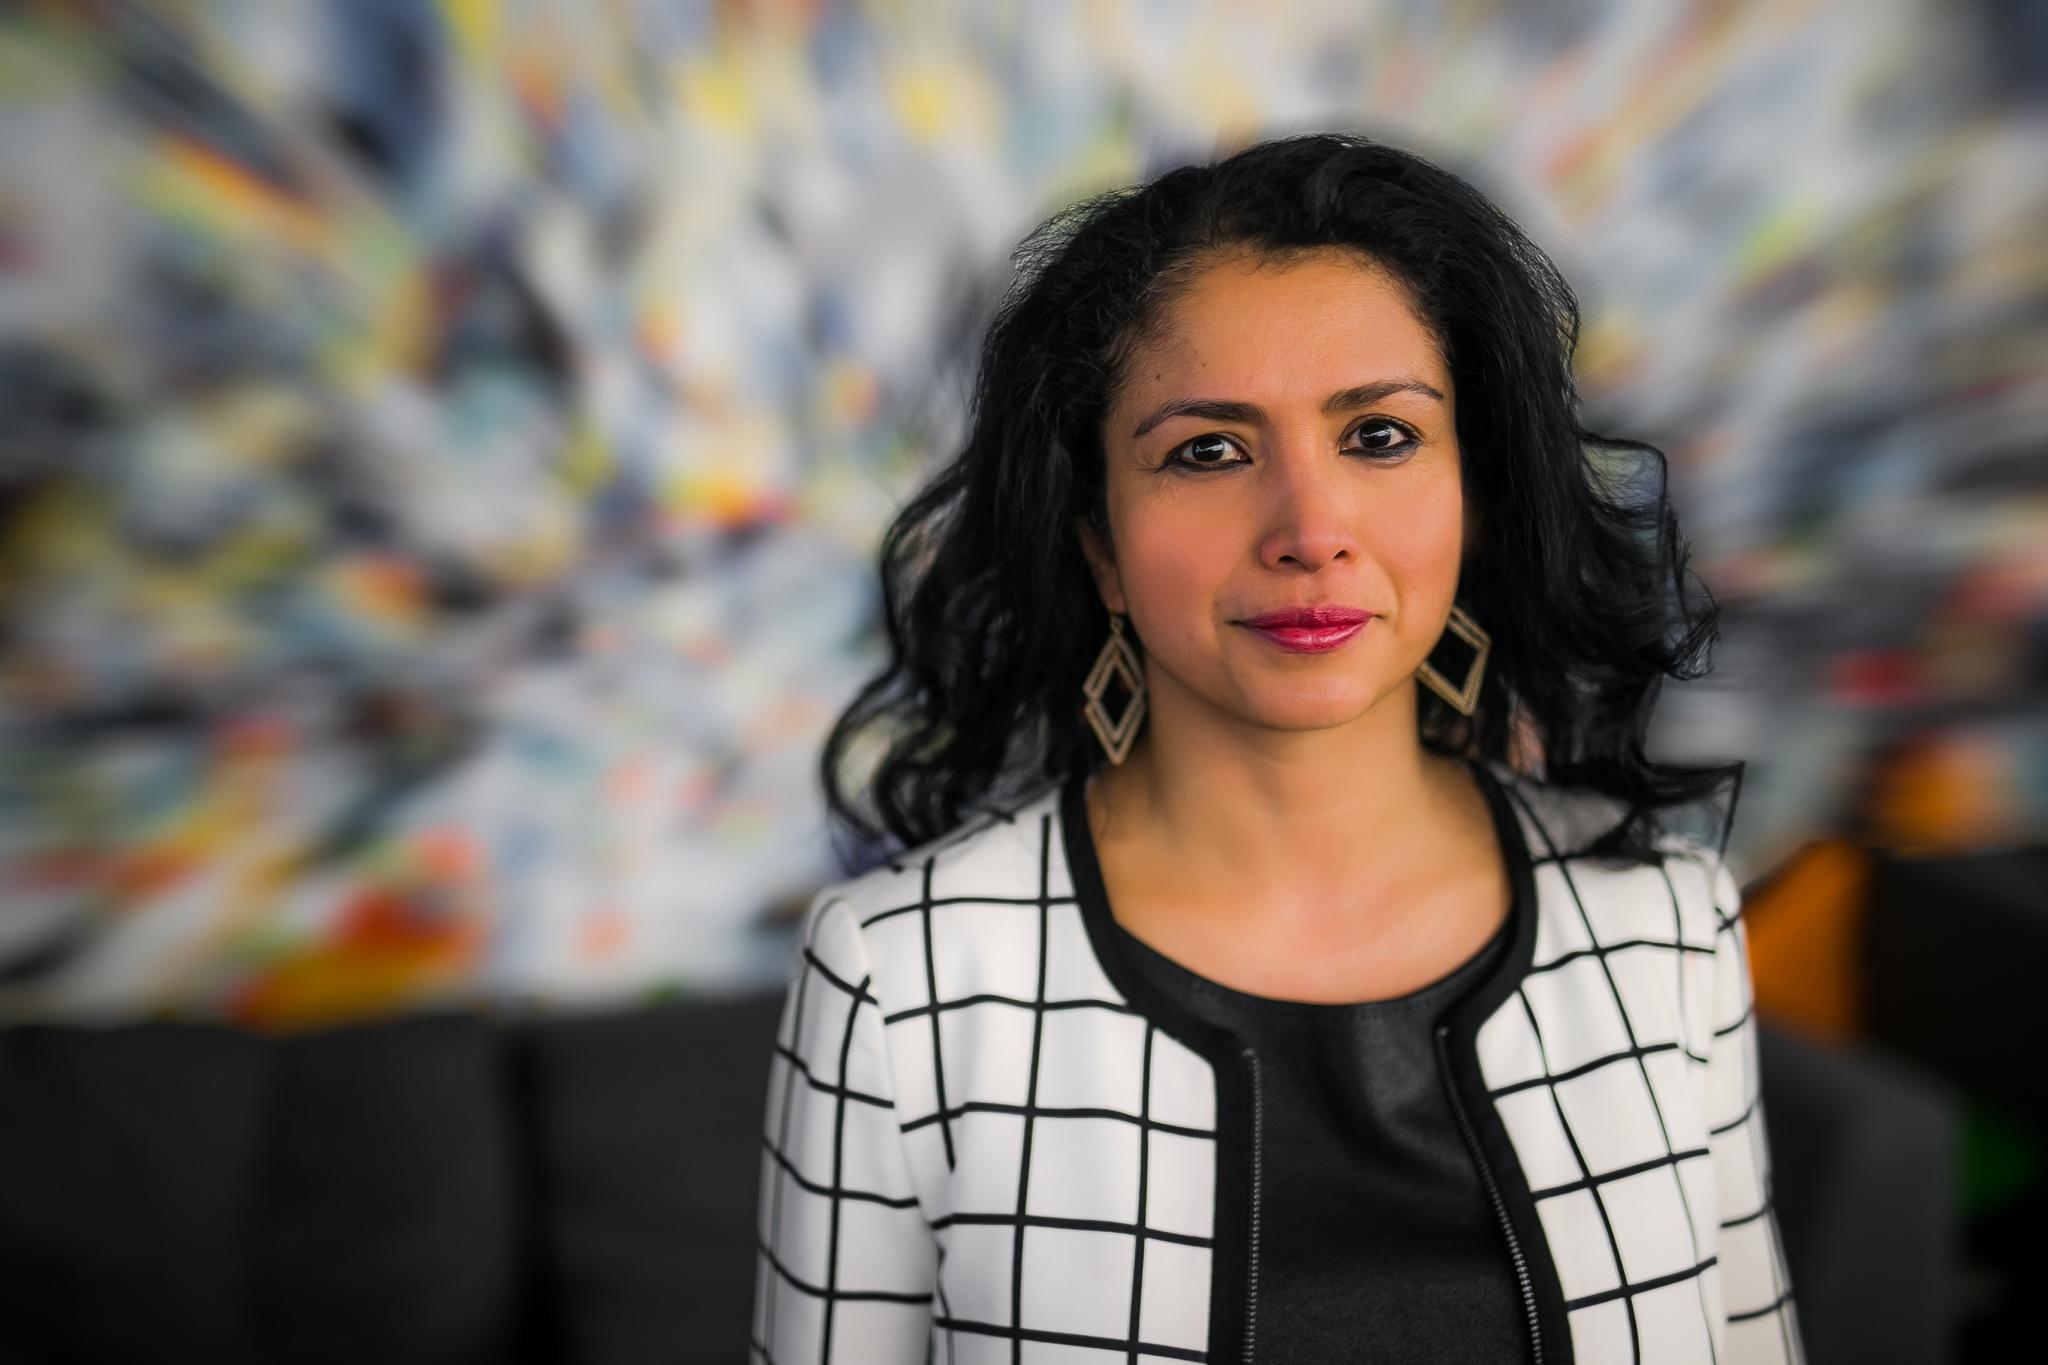 Deepa Kartha, CEO and Founder of Zinda